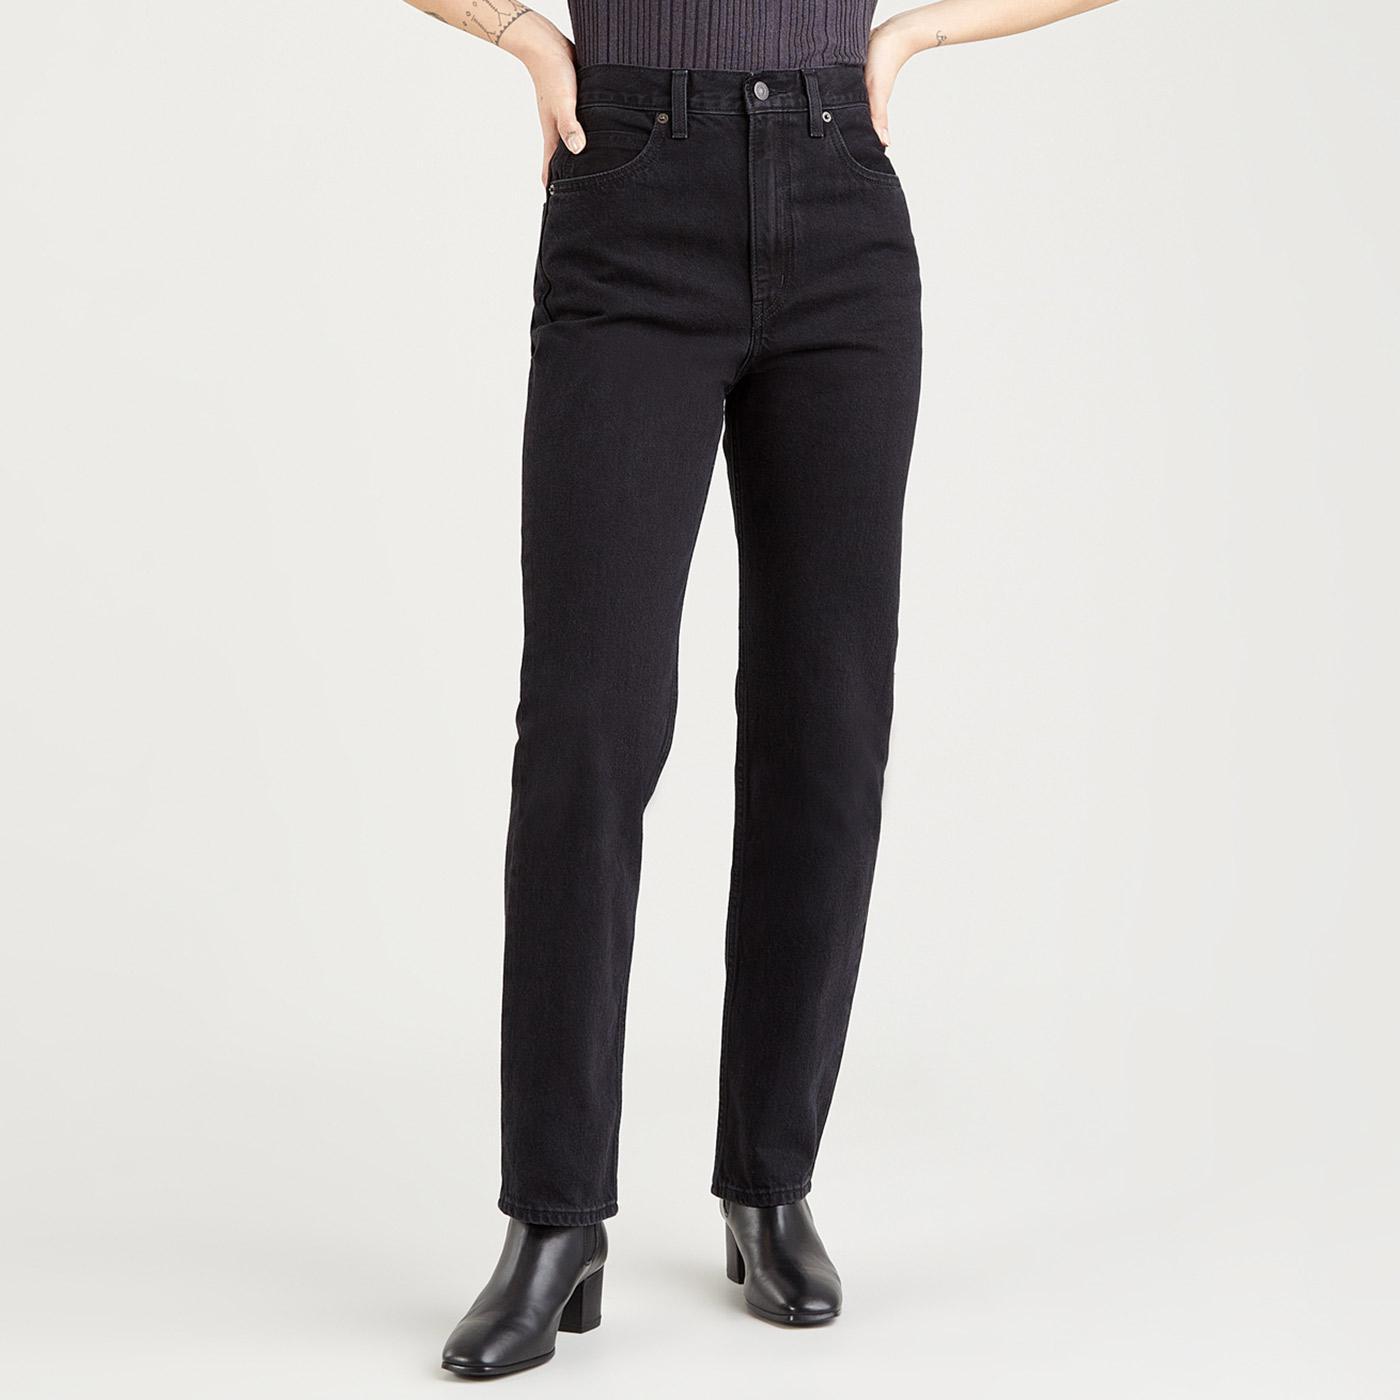 LEVI'S 70s High Slim Straight Jeans (Trainwreck)